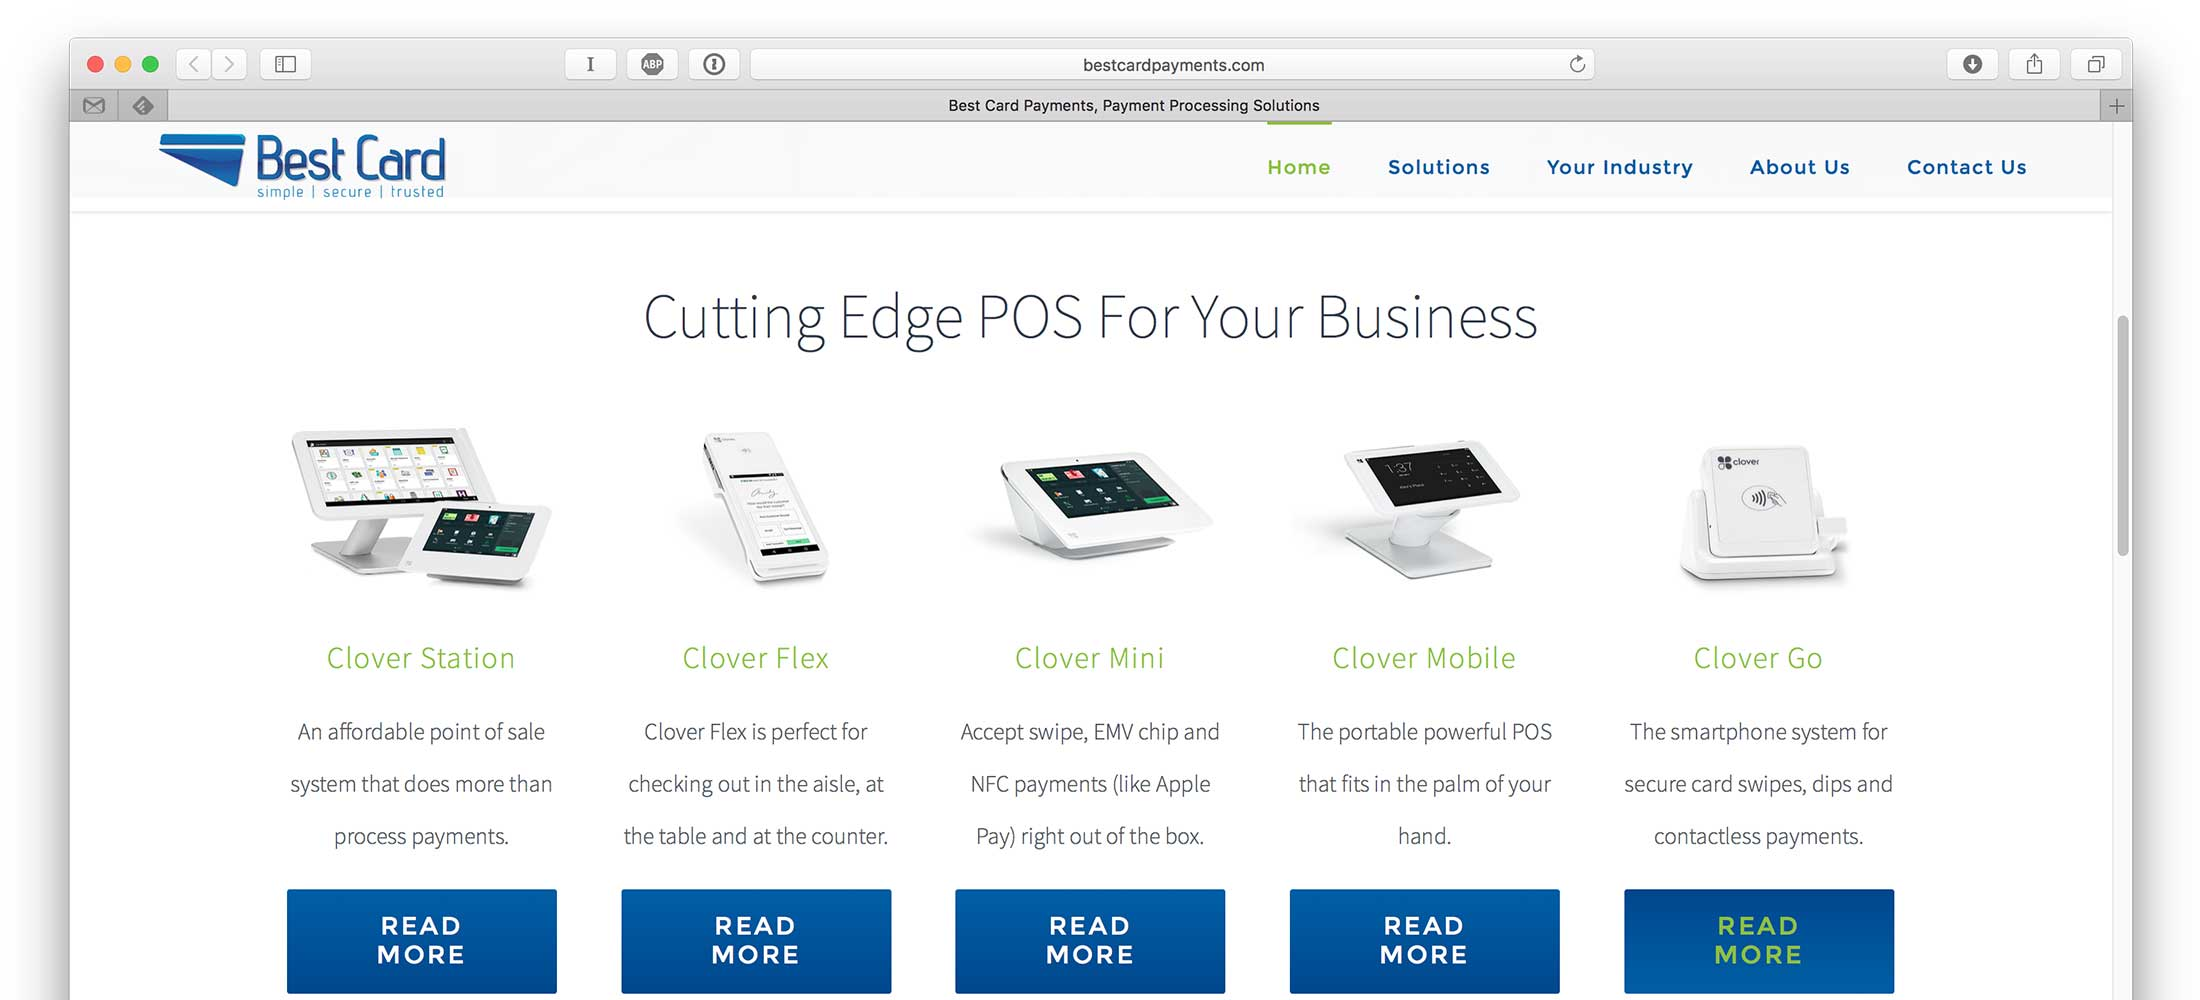 Best Card Website Design 3